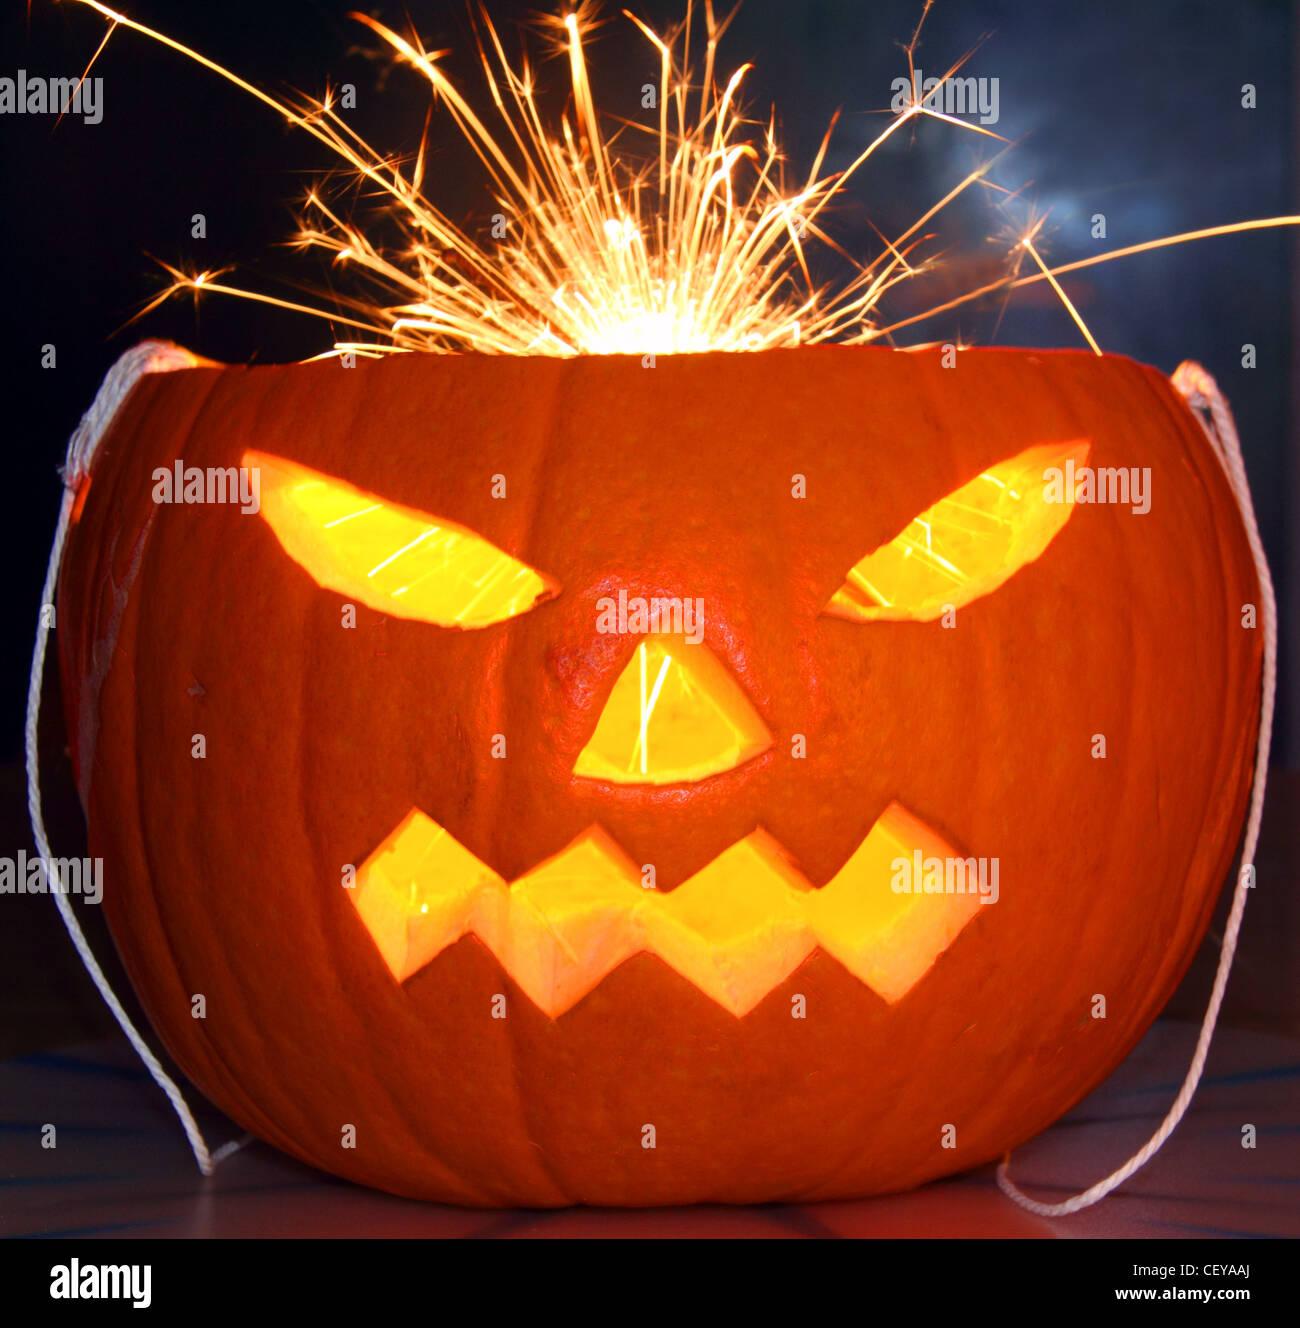 Orange Halloween Pumpkin with a sparkler for hair - Stock Image